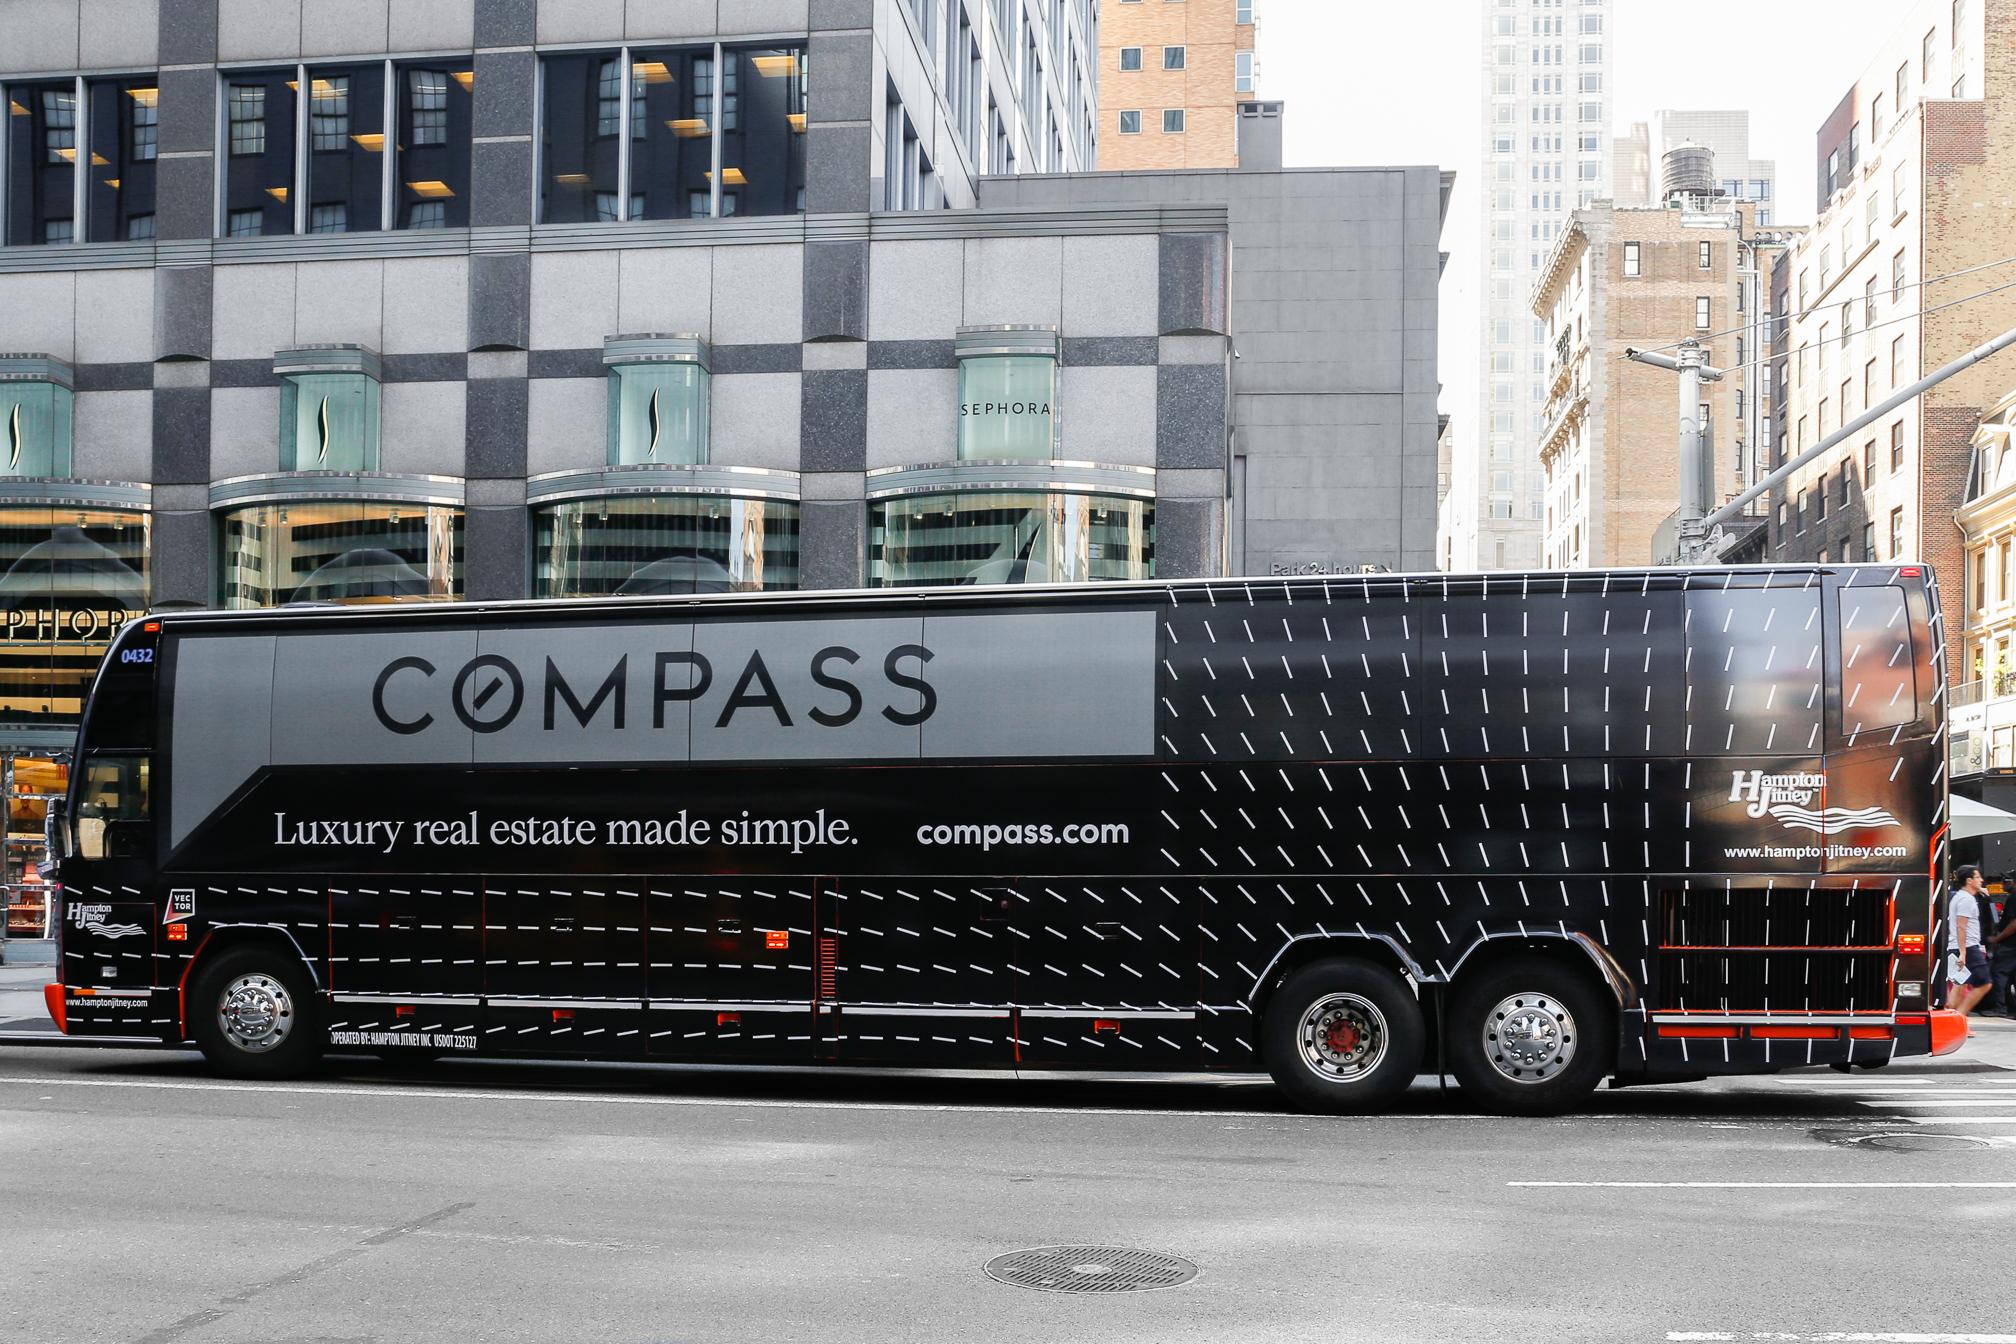 HAMPTON JITNEY BUS WRAP - COMPASS